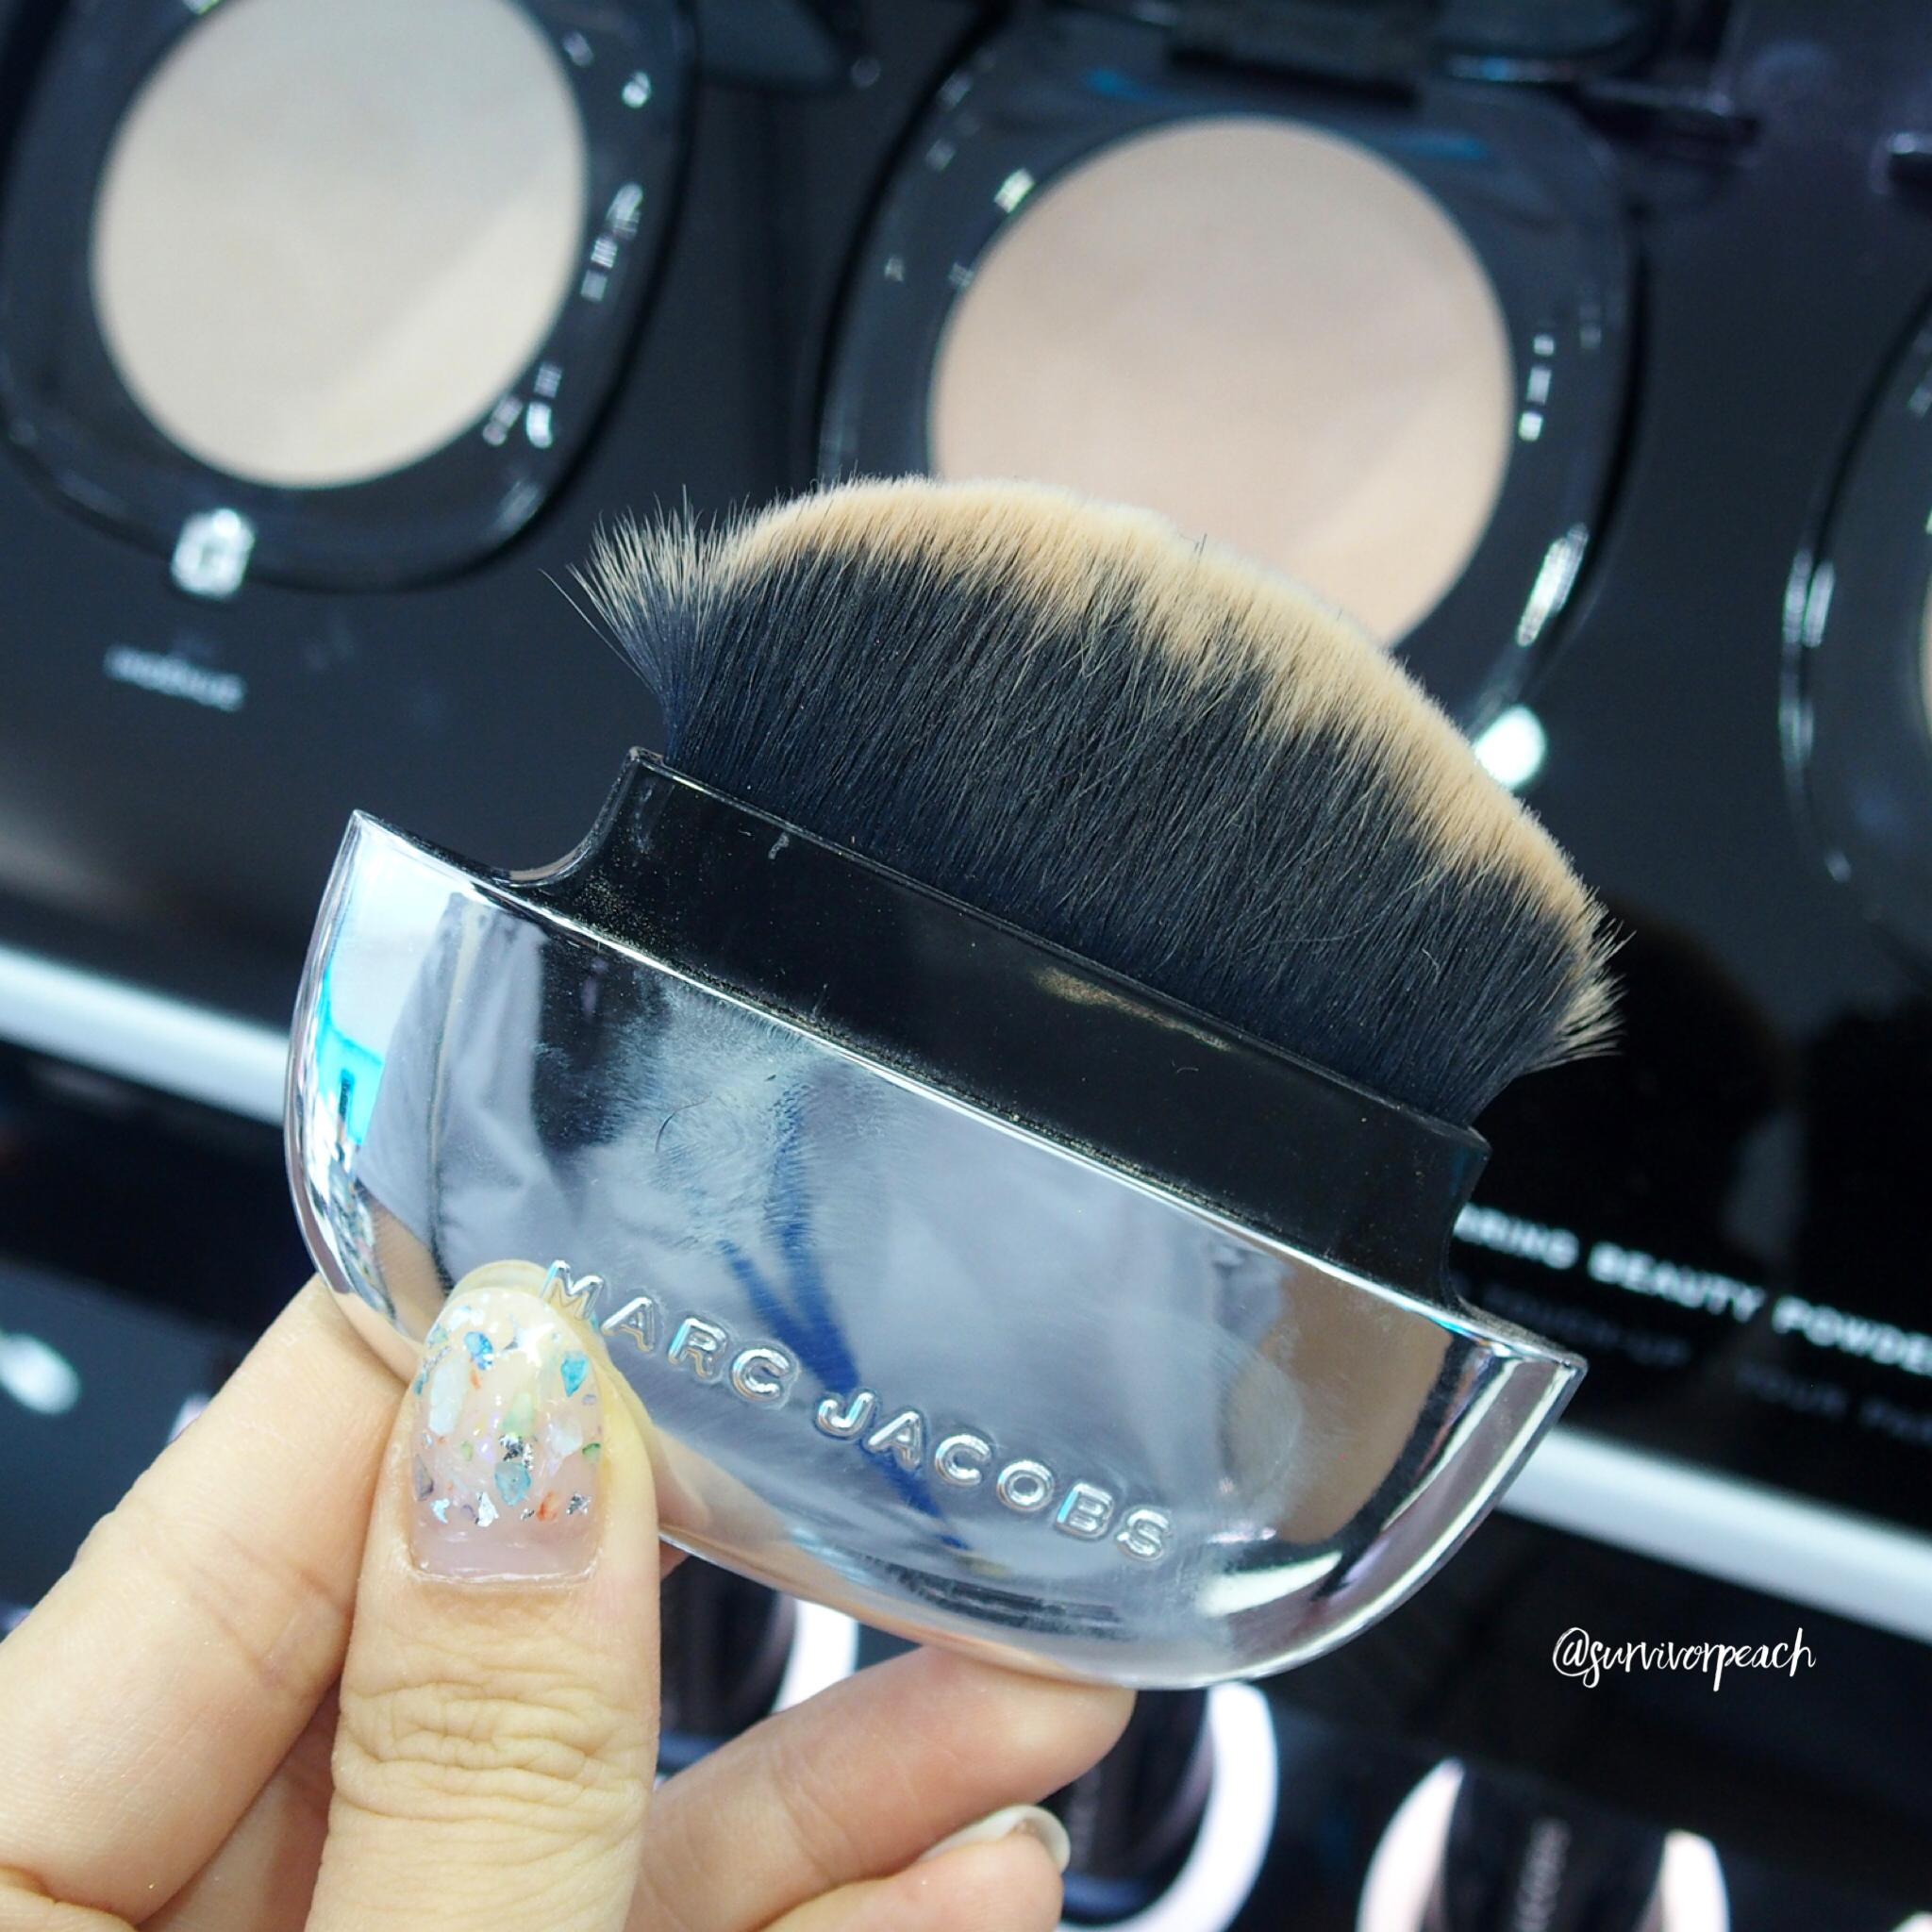 Marc Jacobs Accomplice Marc Jacobs Accomplice Instant Blurring Beauty Powder - compact brush